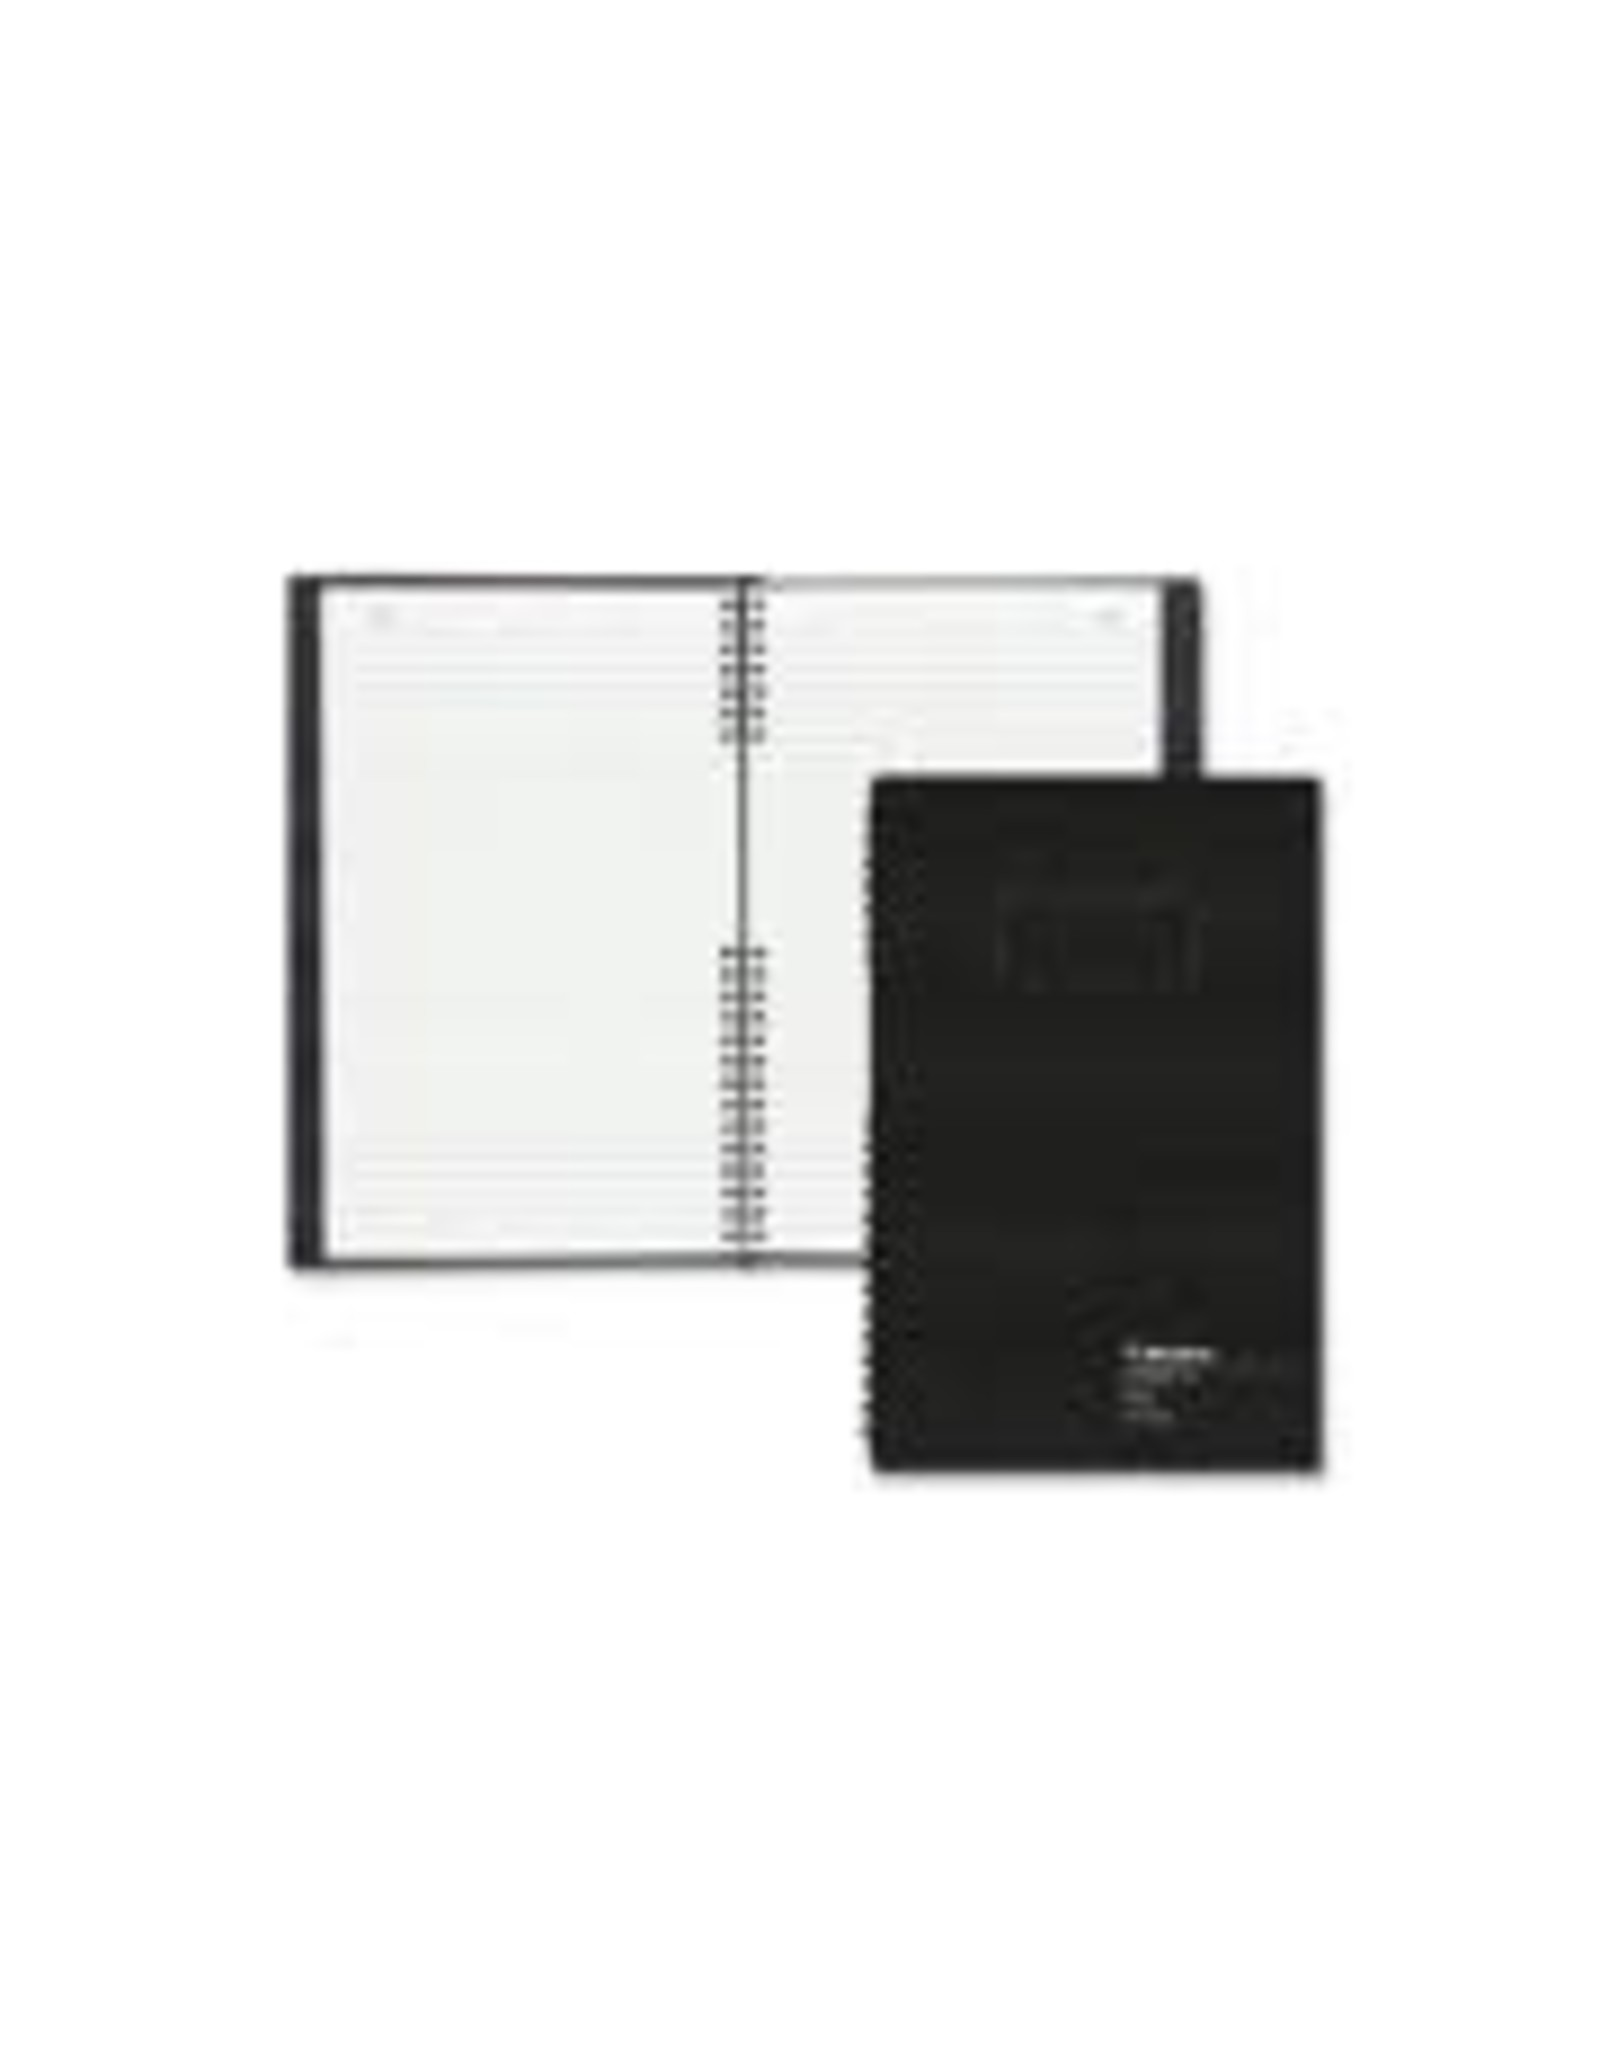 Blueline ACCOUNT BOOK-ACCOUNTPRO, 200 PAGE WHITE 12.5X7-7/8 RECORD